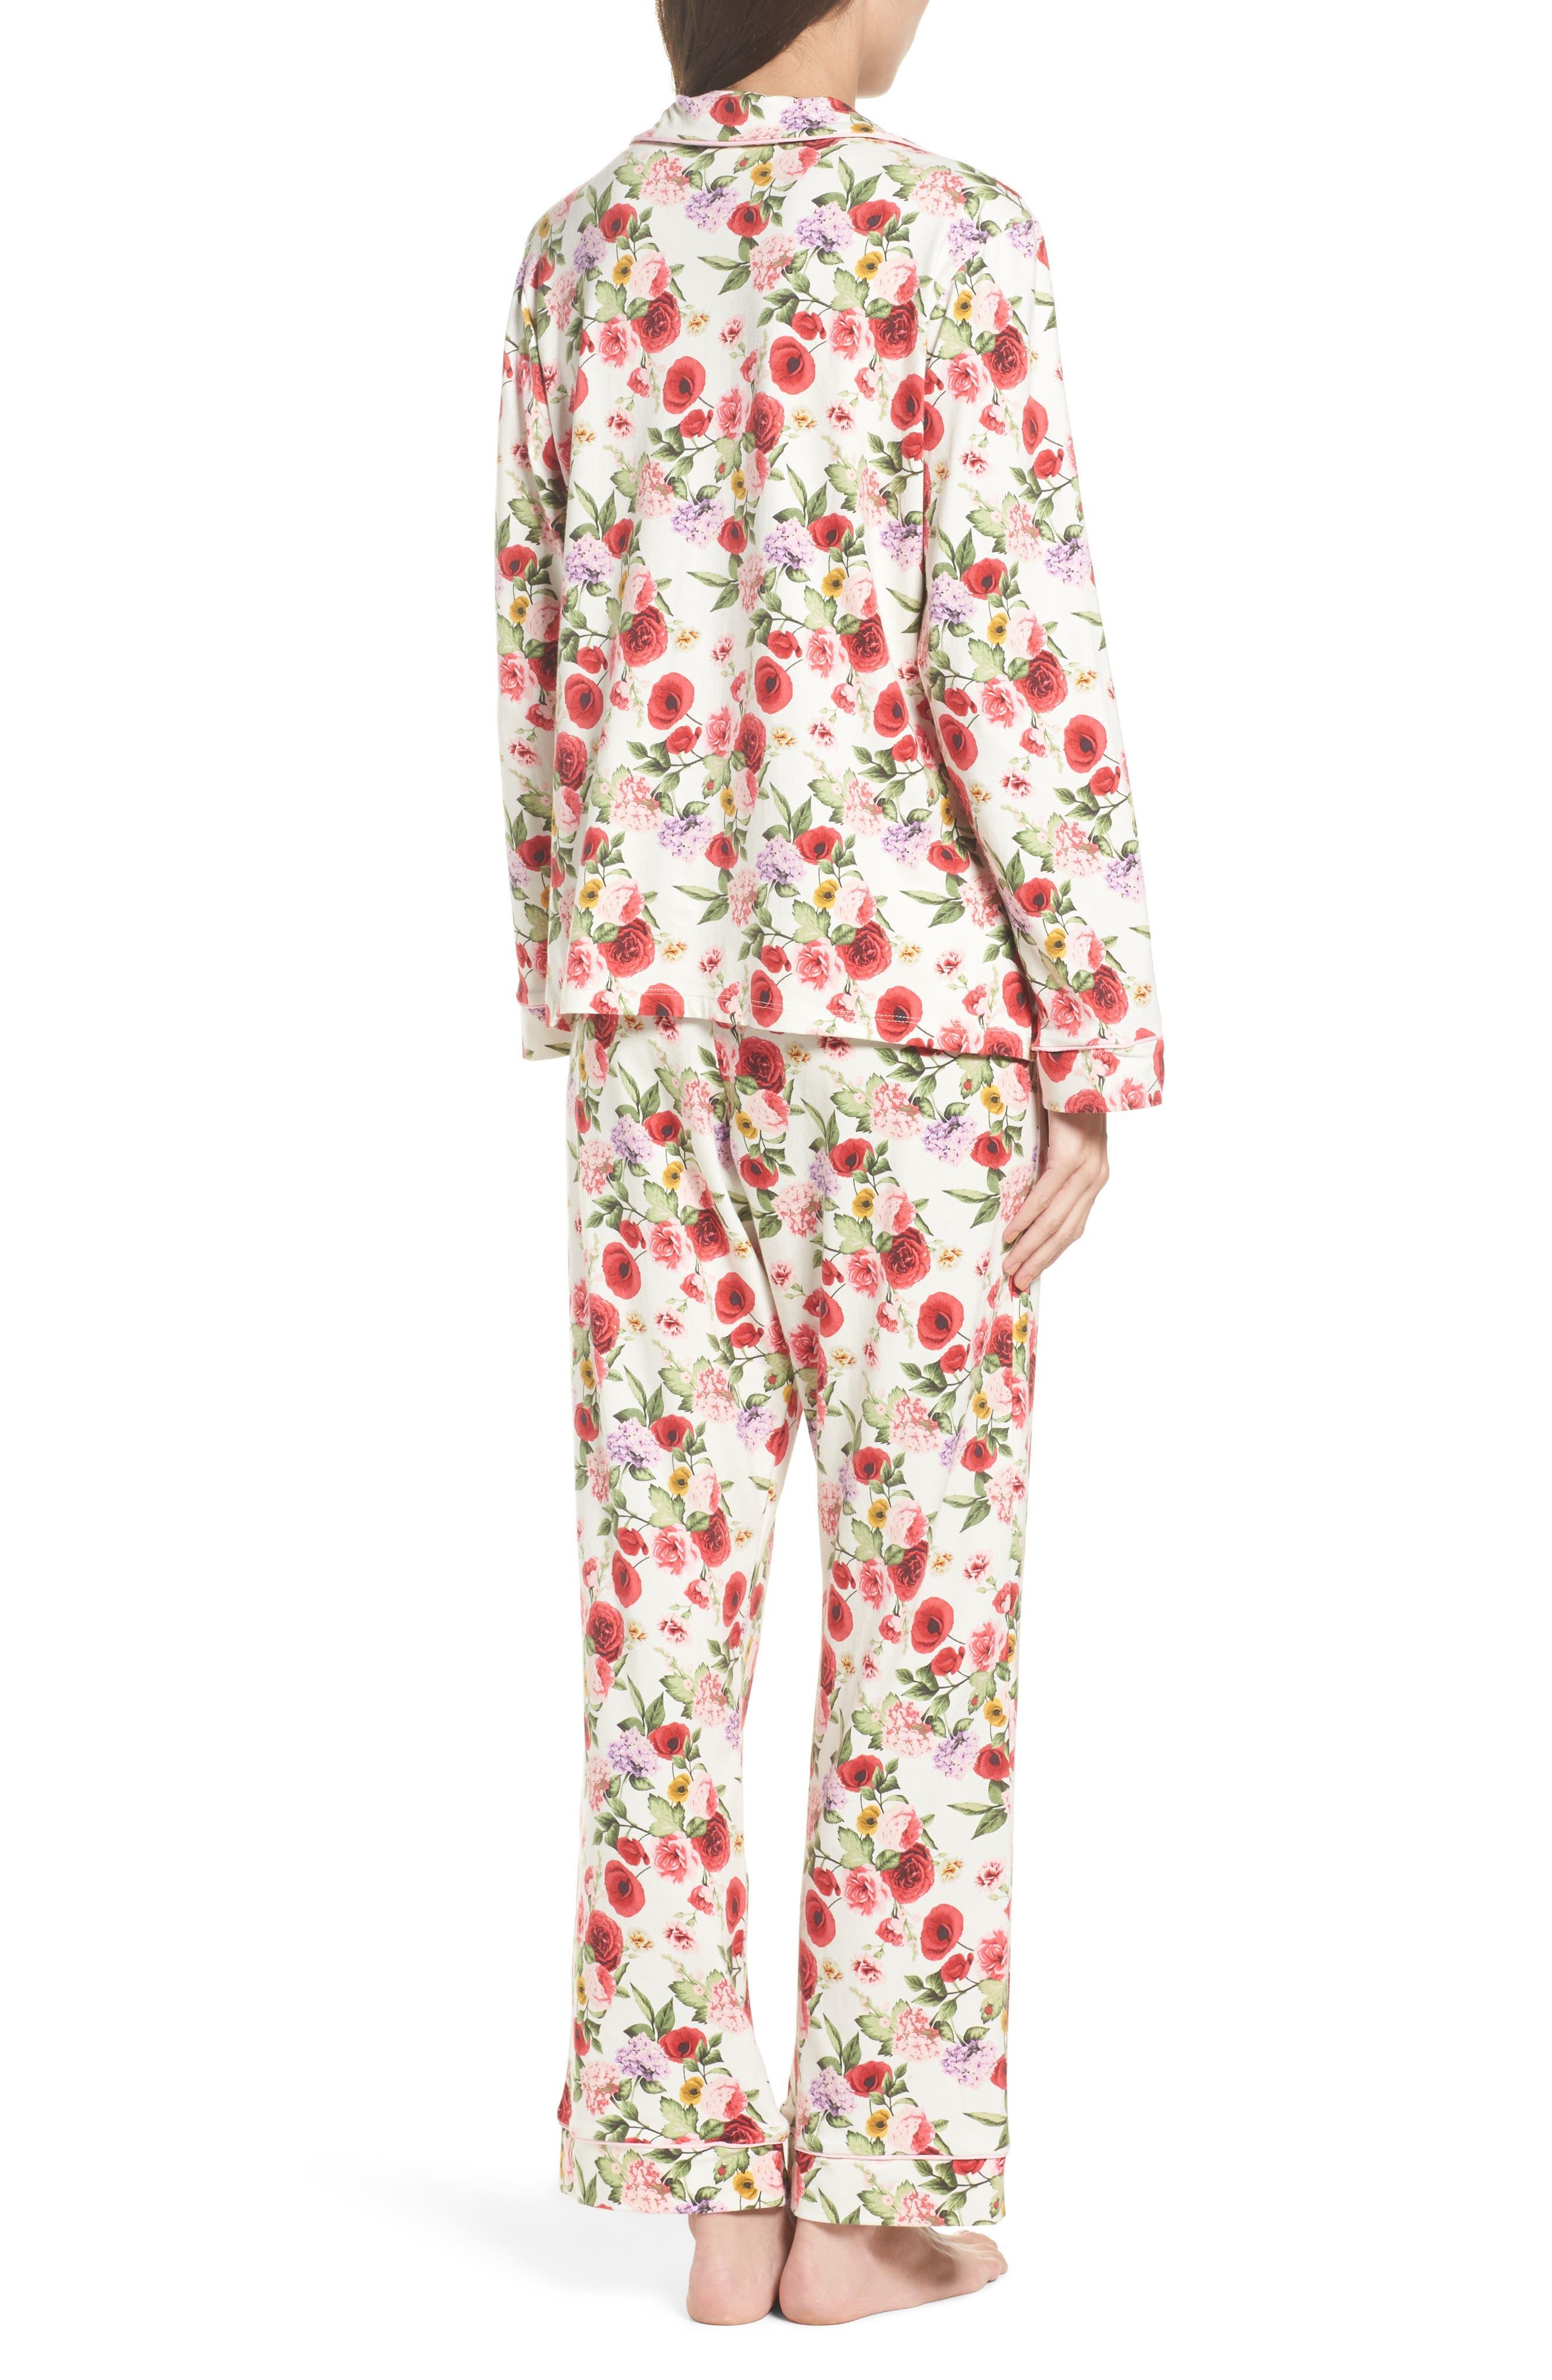 Flower Print Pajamas,                             Alternate thumbnail 2, color,                             650